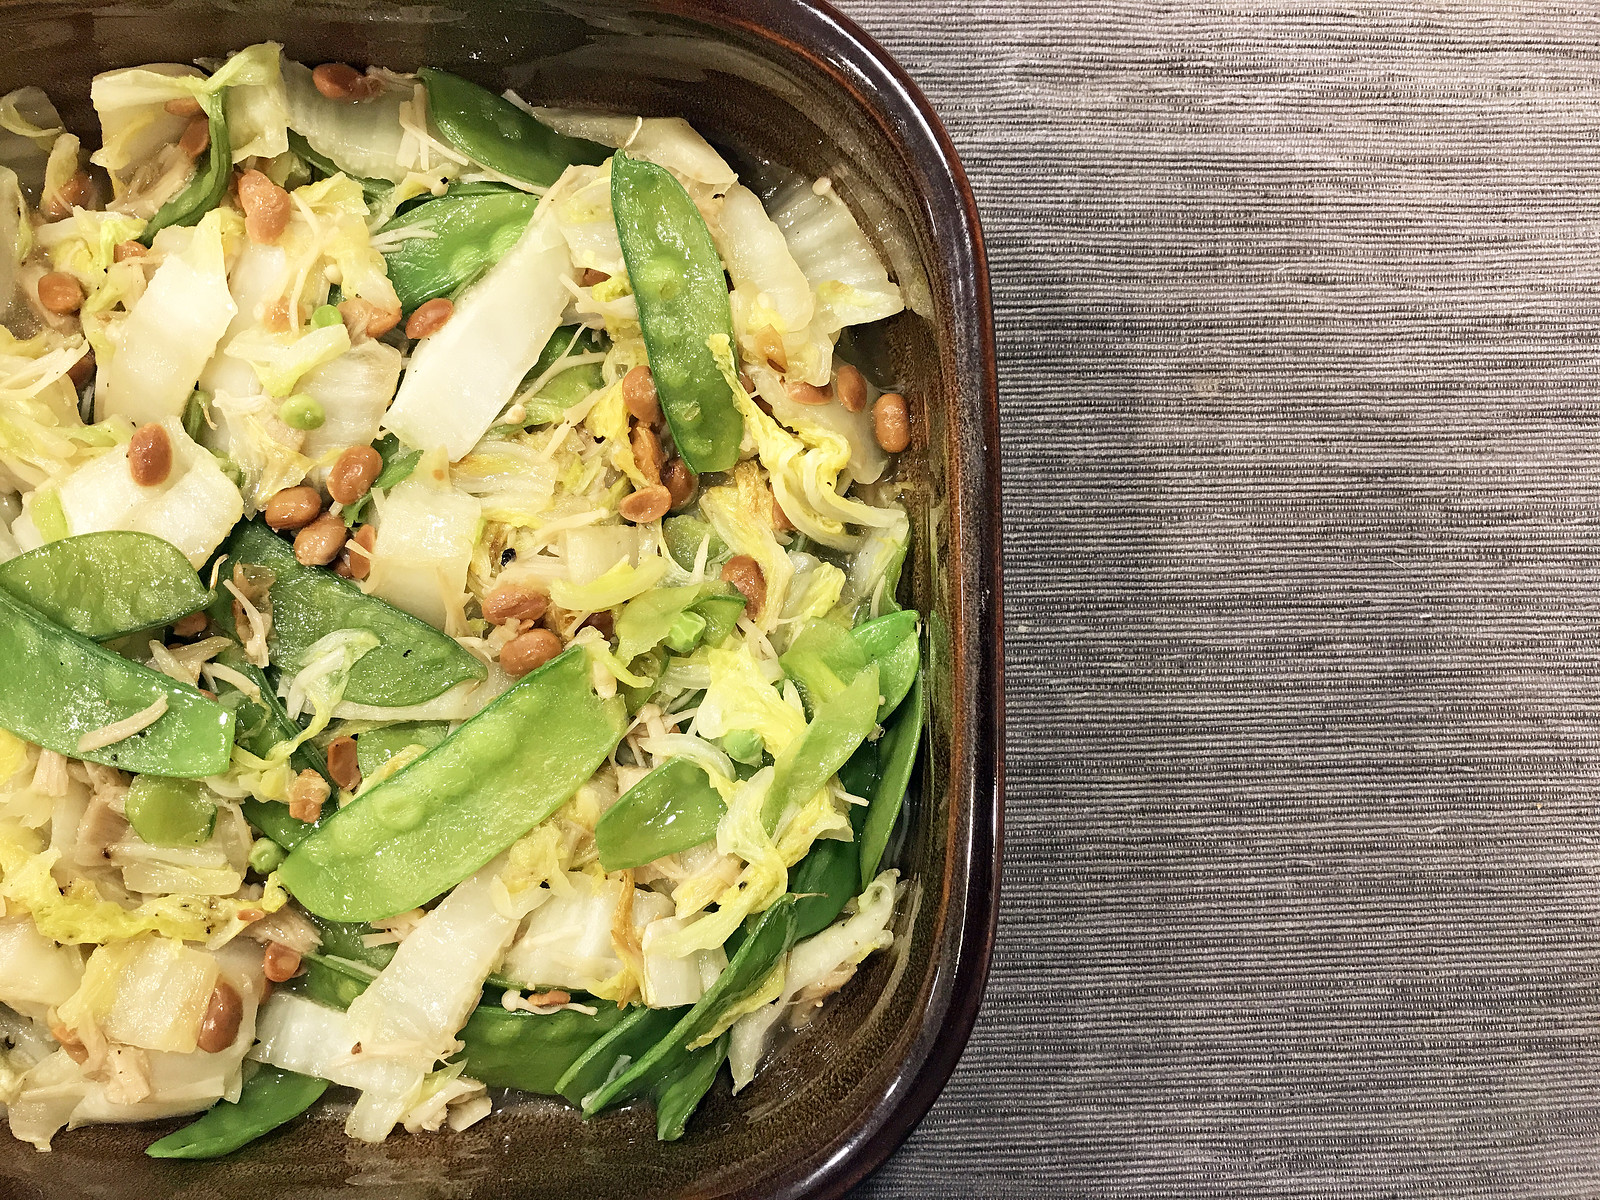 Thai-Style Mixed Vegetable Stir-Fry